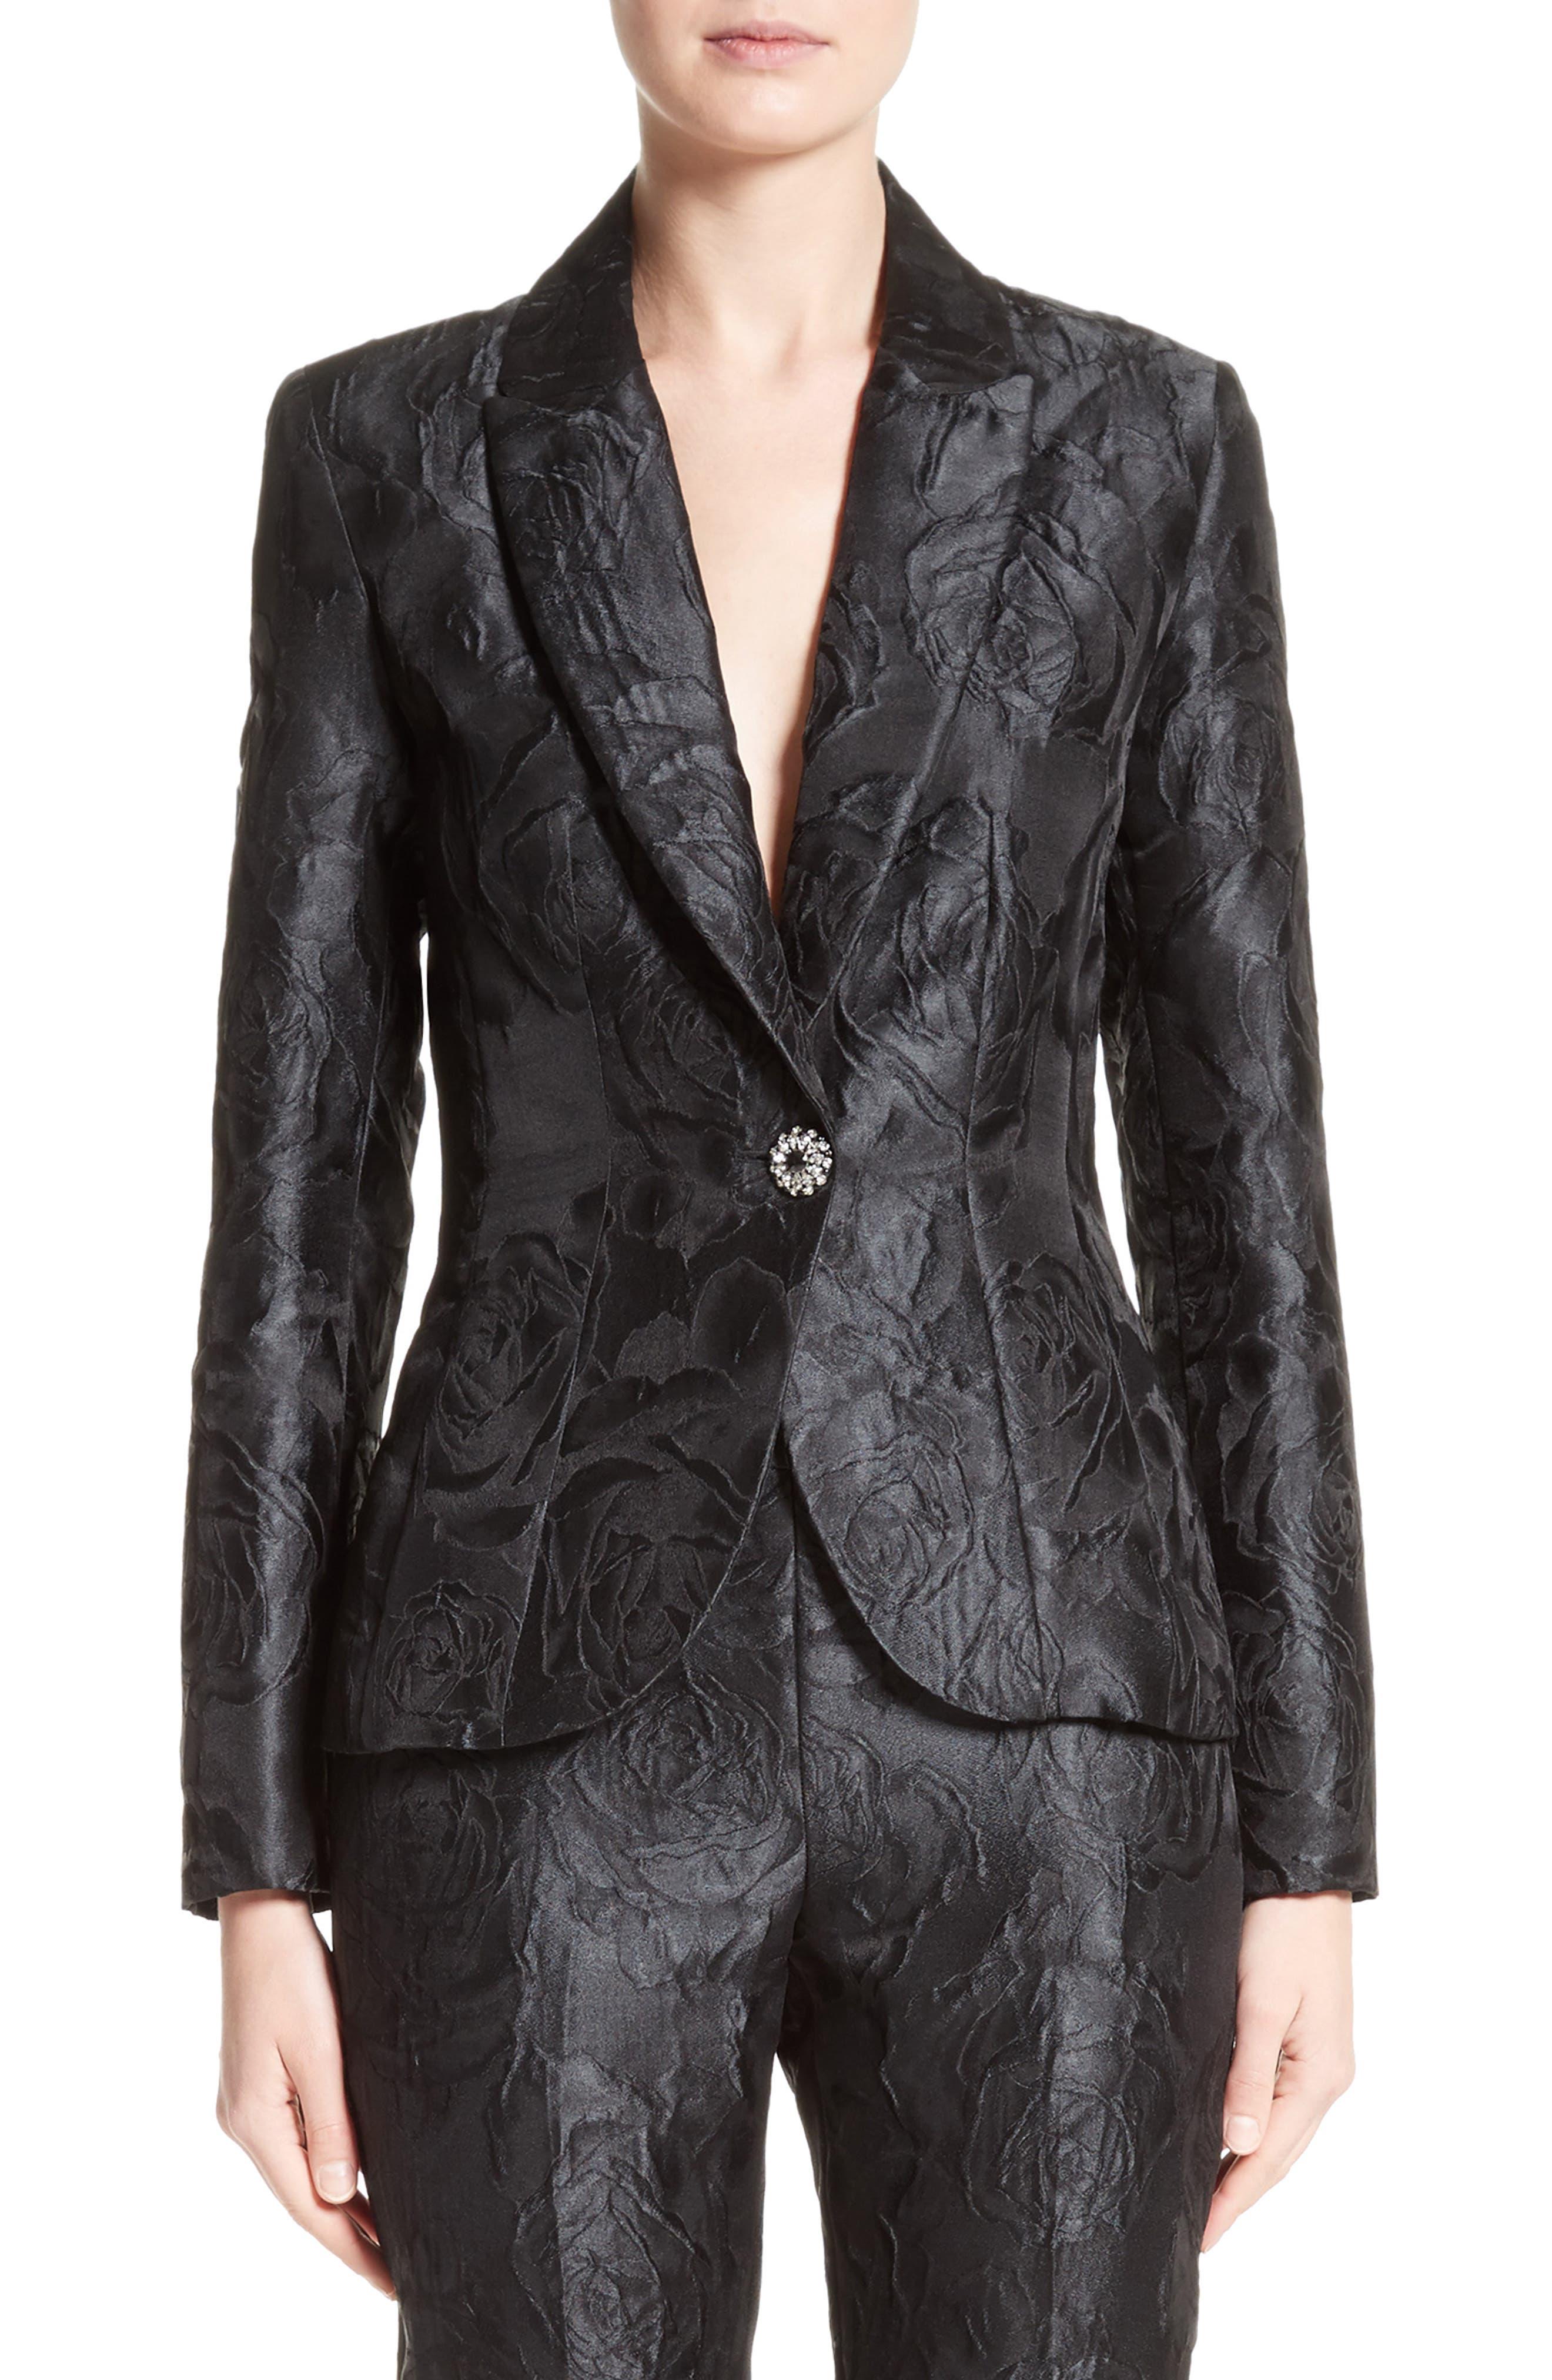 Avani Rose Jacquard Jacket,                         Main,                         color, 001